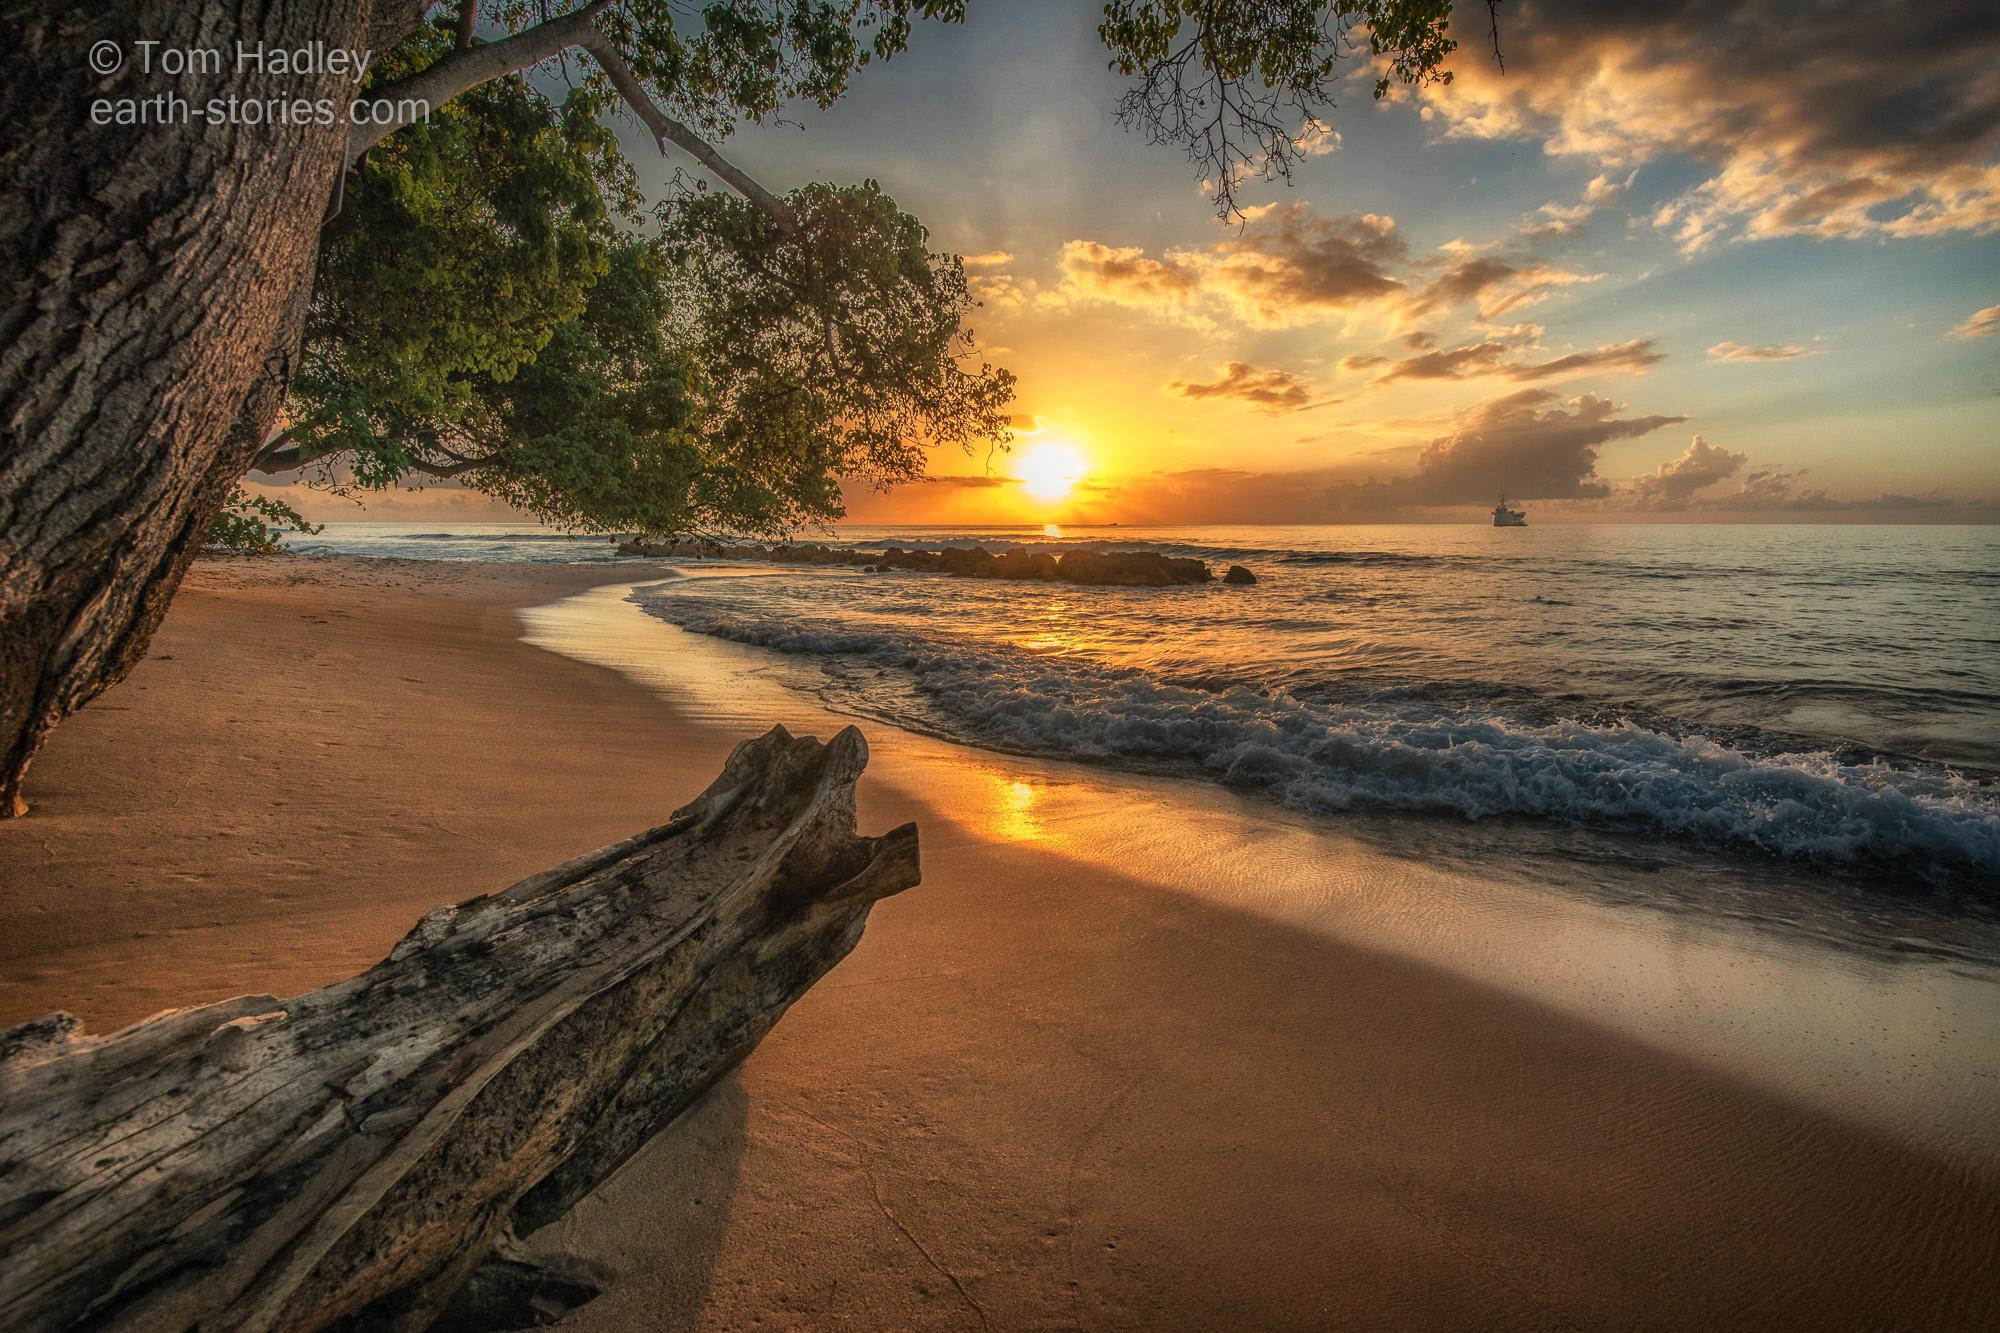 Heywoods Beach, Barbados